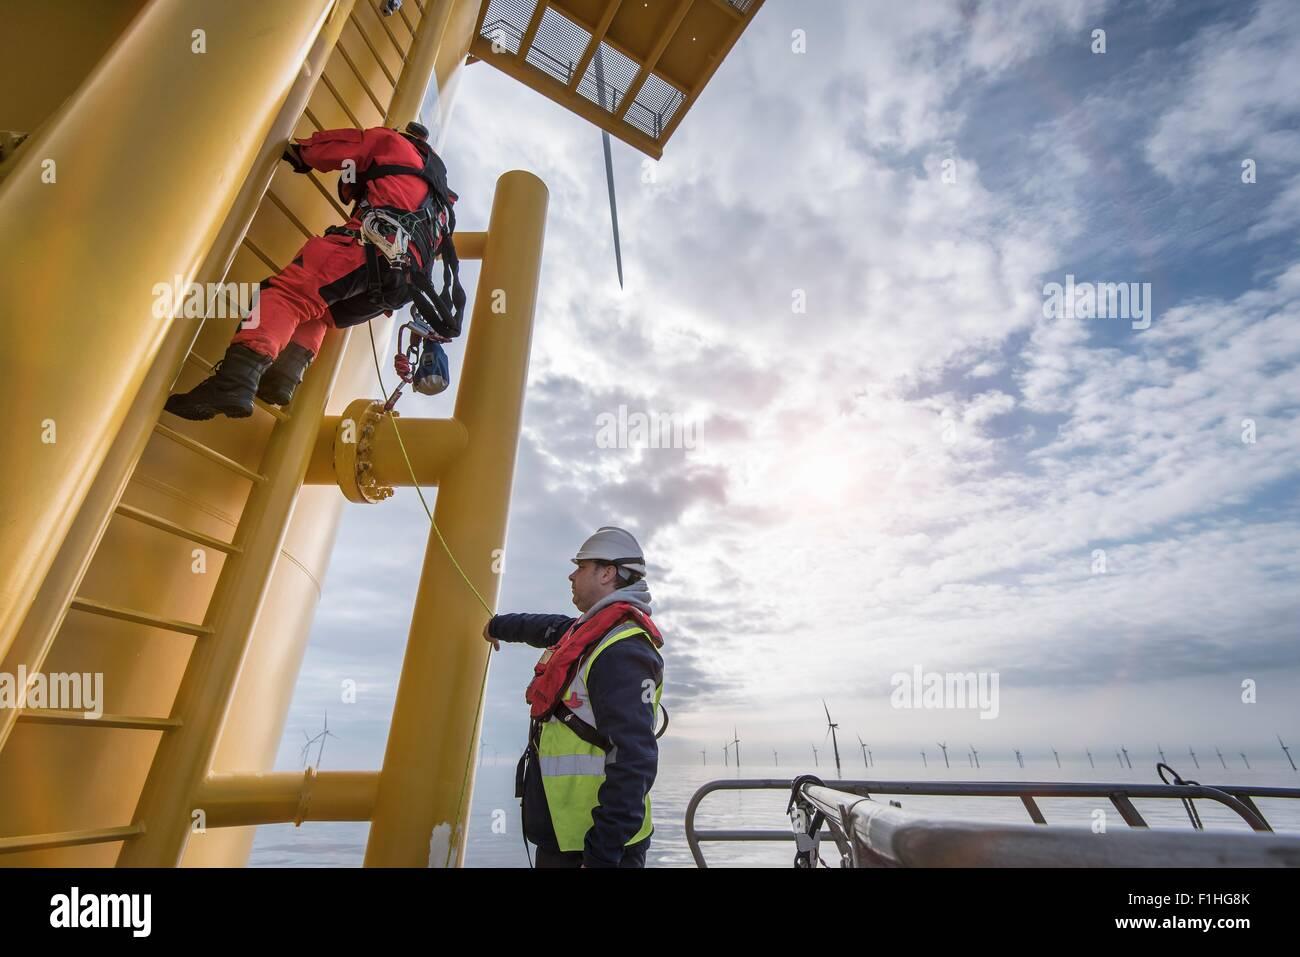 Engineer climbing wind turbine at offshore windfarm - Stock Image